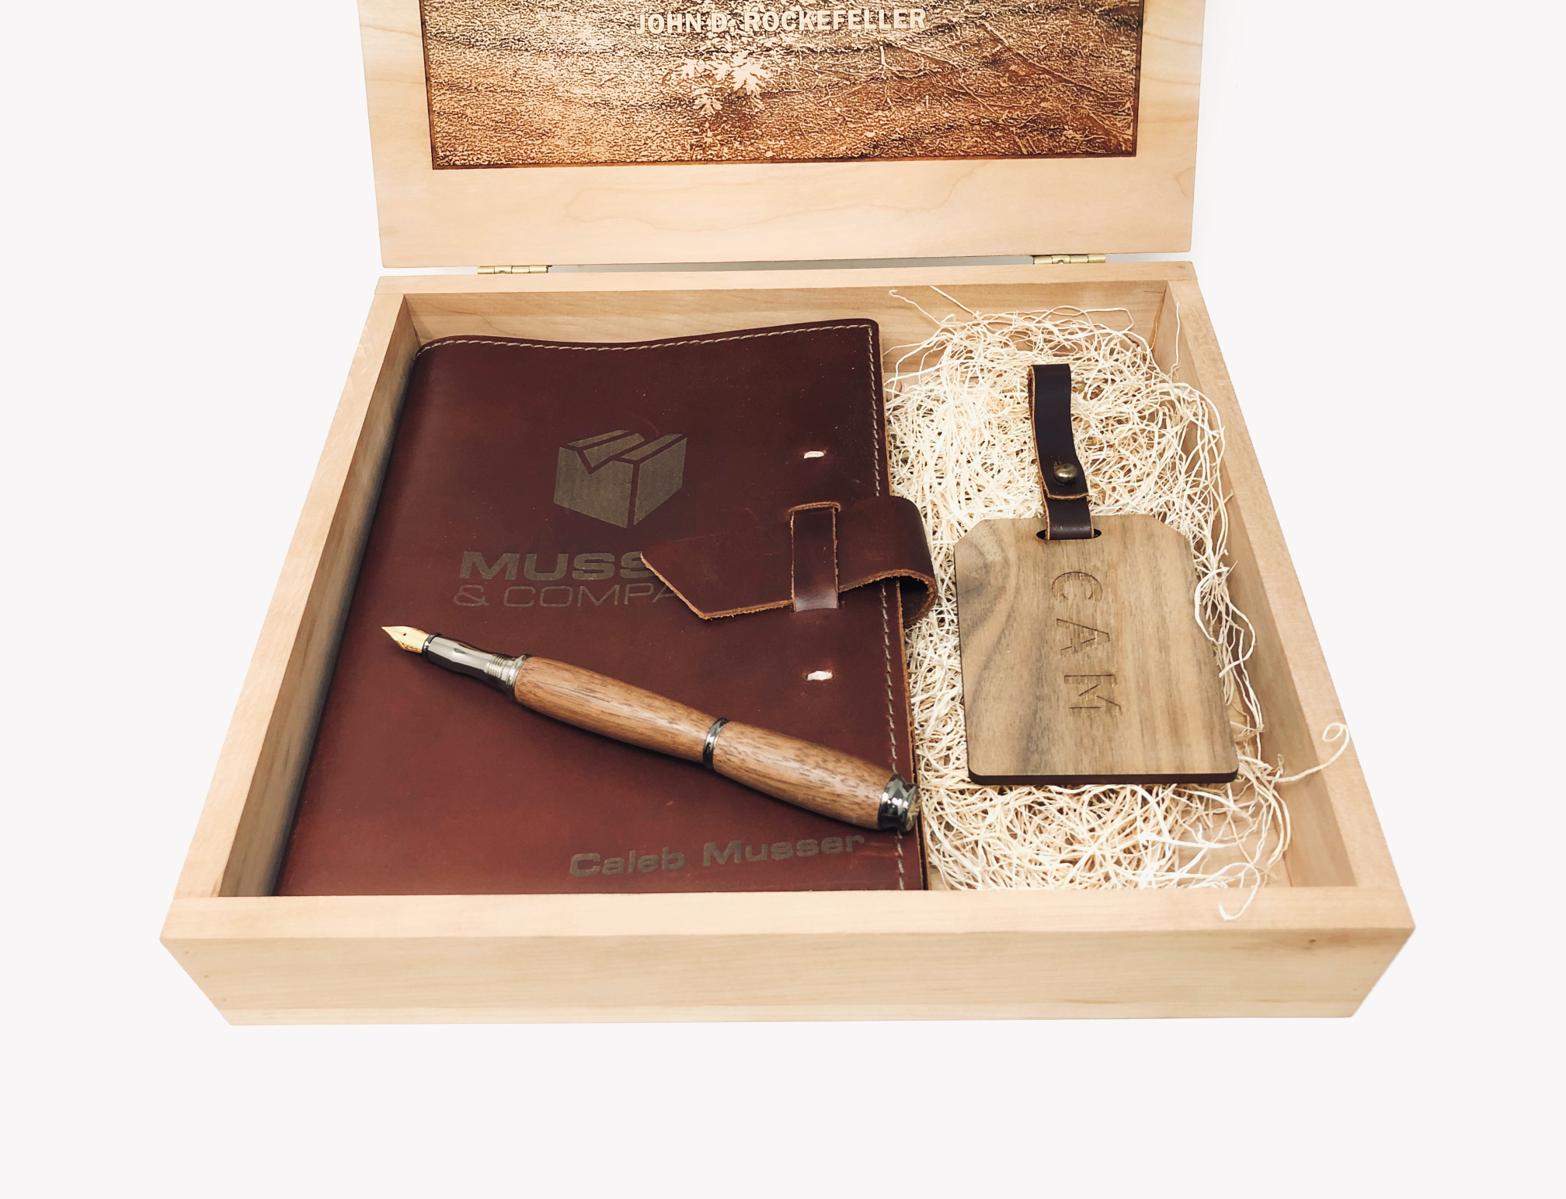 leather journal pen set.jpg.png